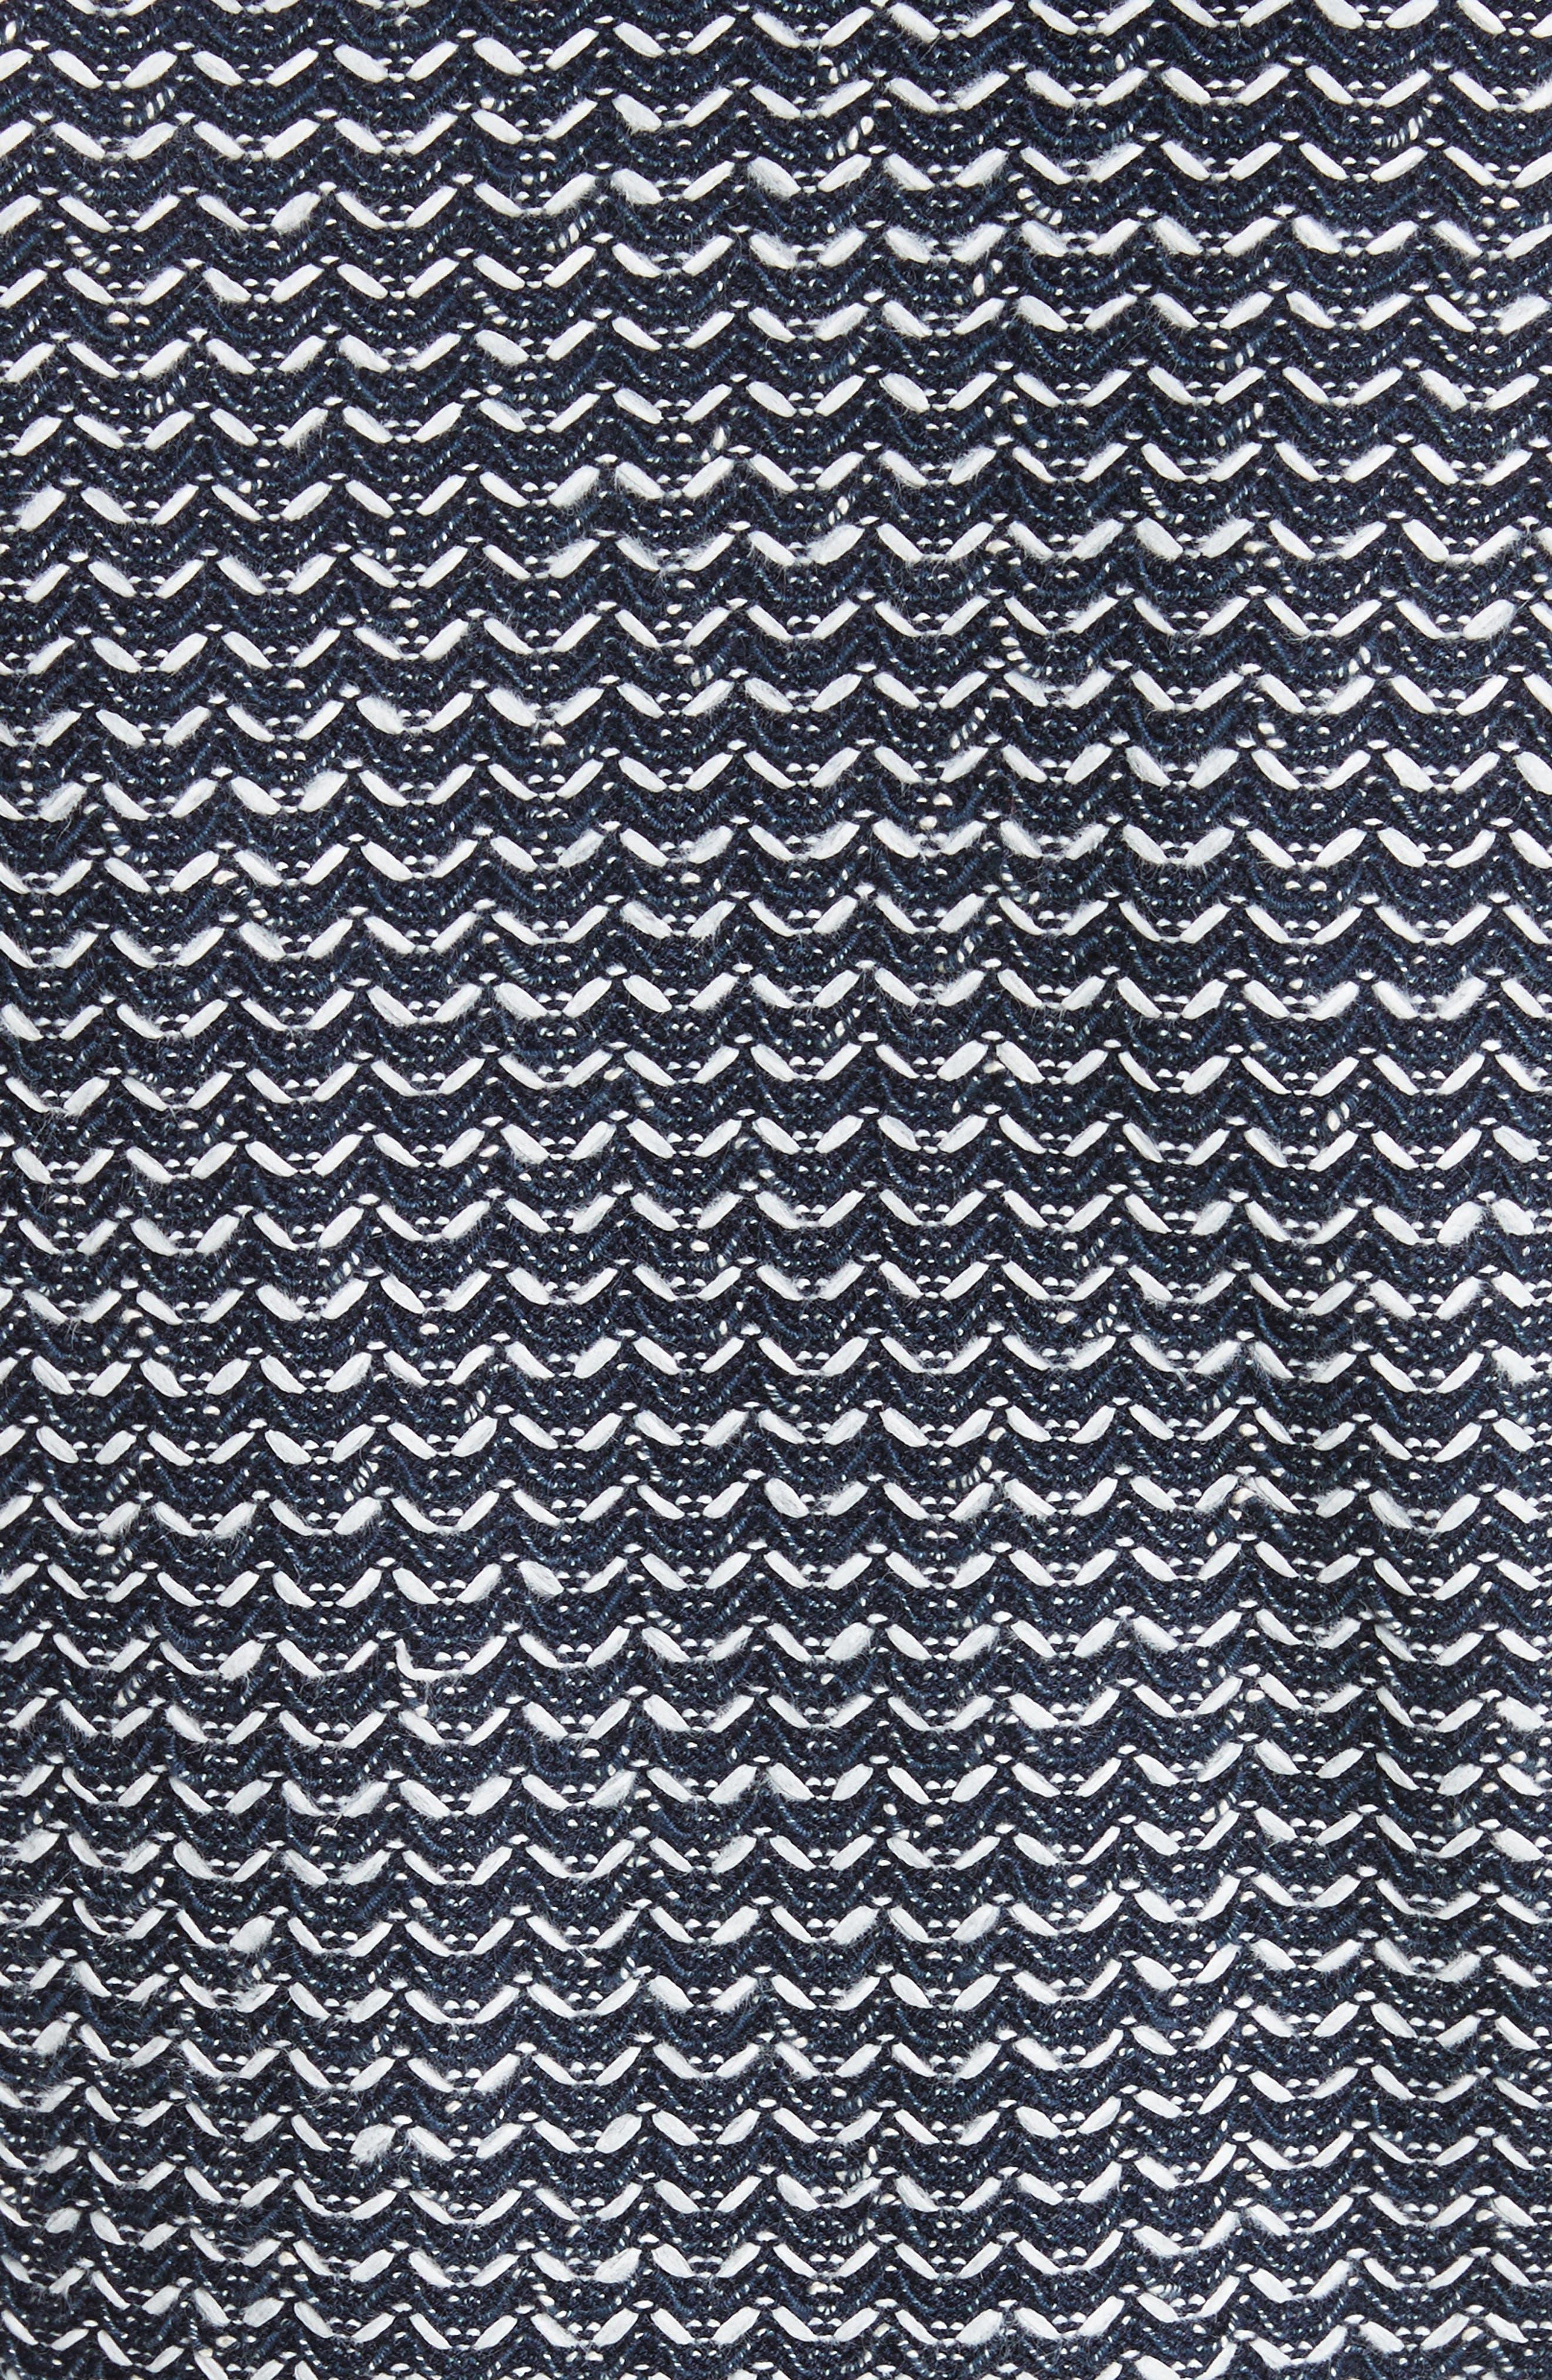 Chevron Knit Jacket,                             Alternate thumbnail 5, color,                             Navy Multi